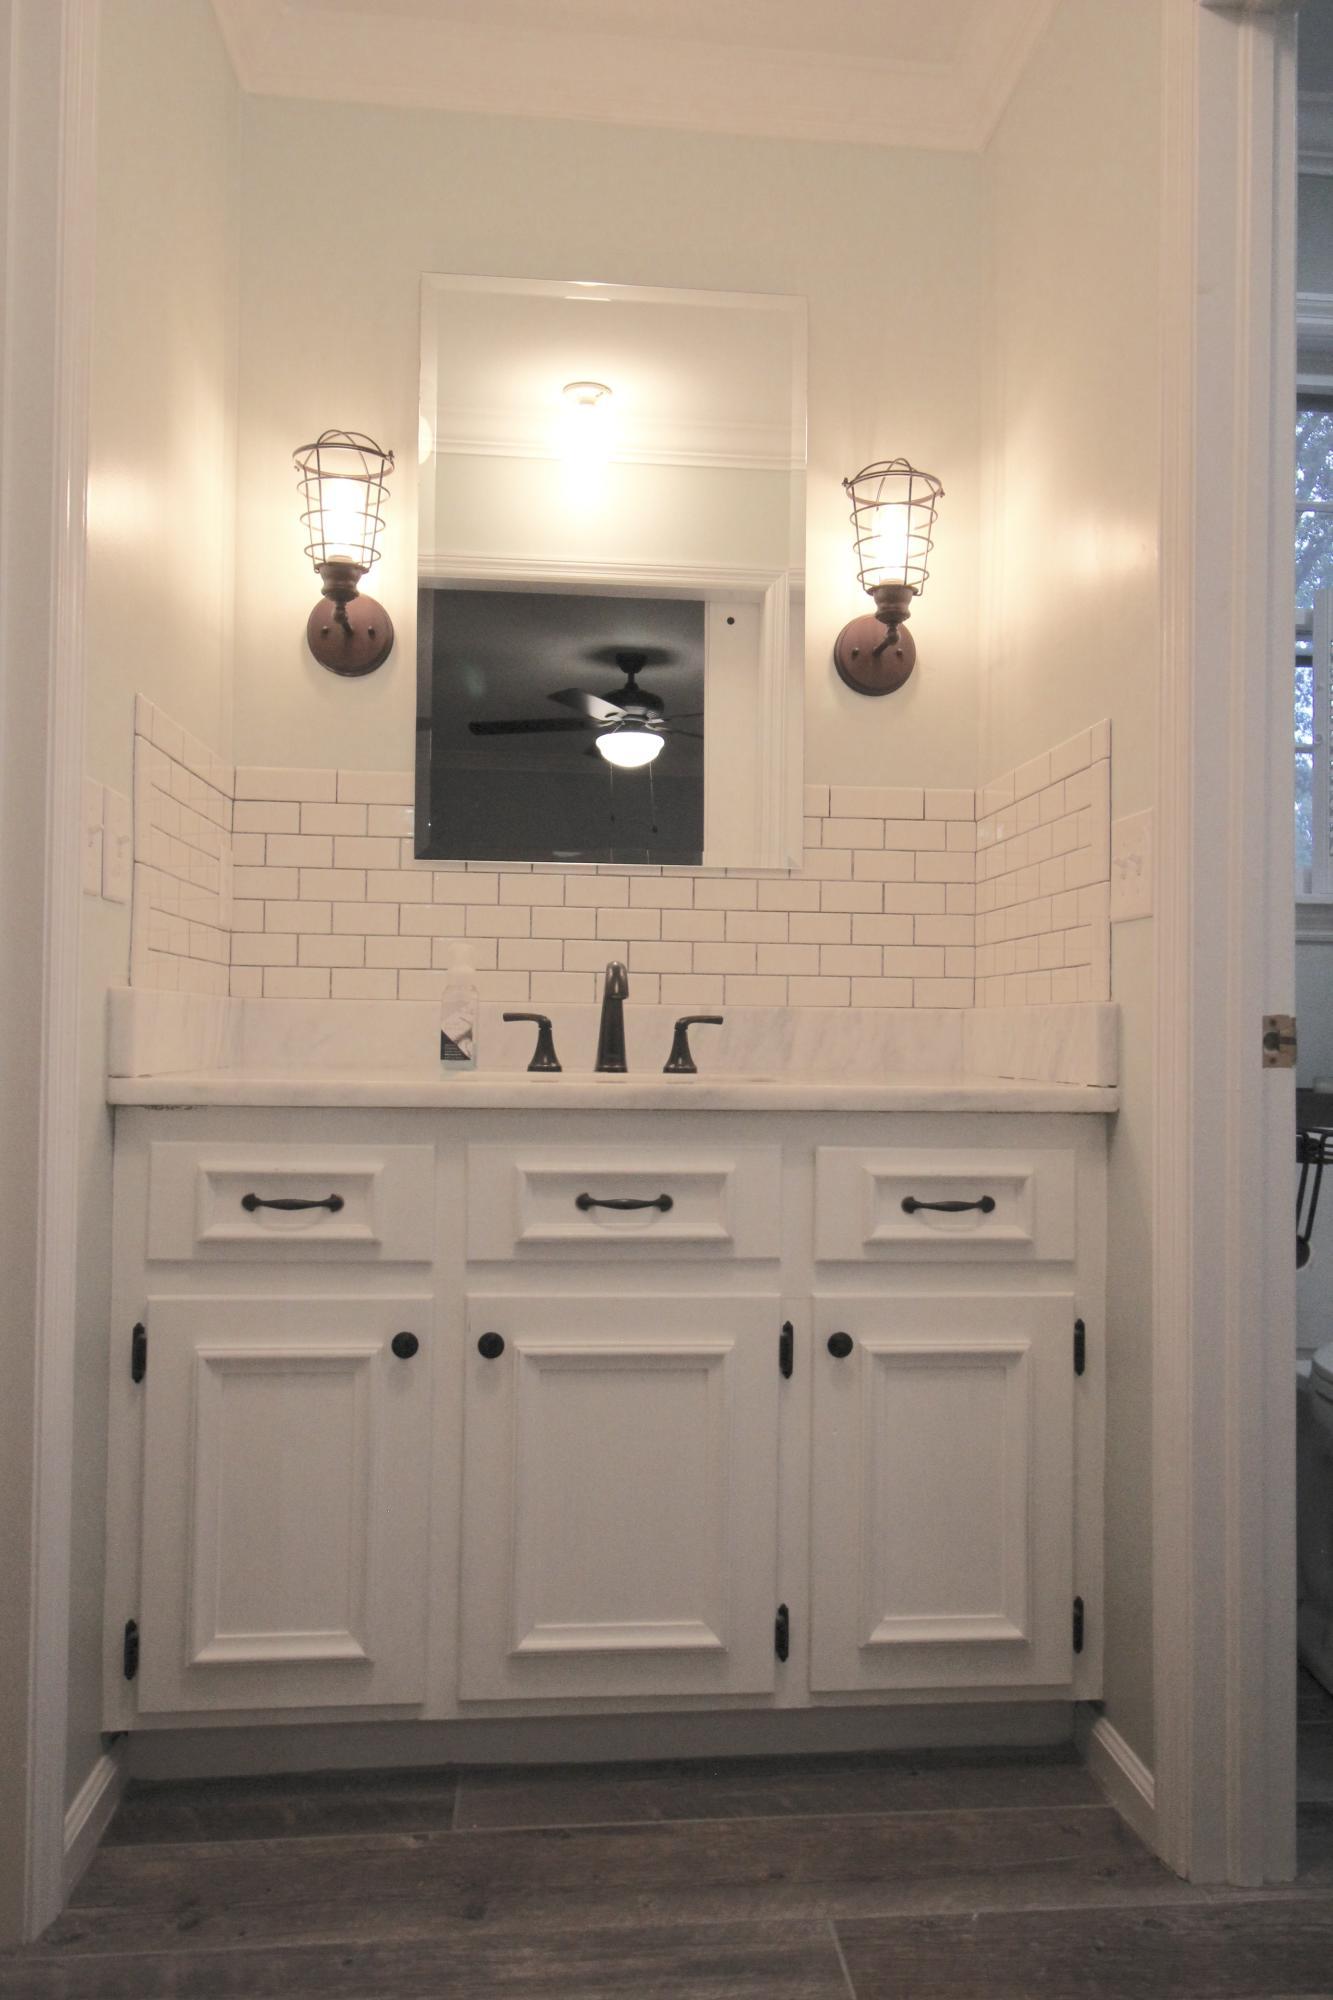 Sandhurst Homes For Sale - 3 Hampton, Charleston, SC - 25